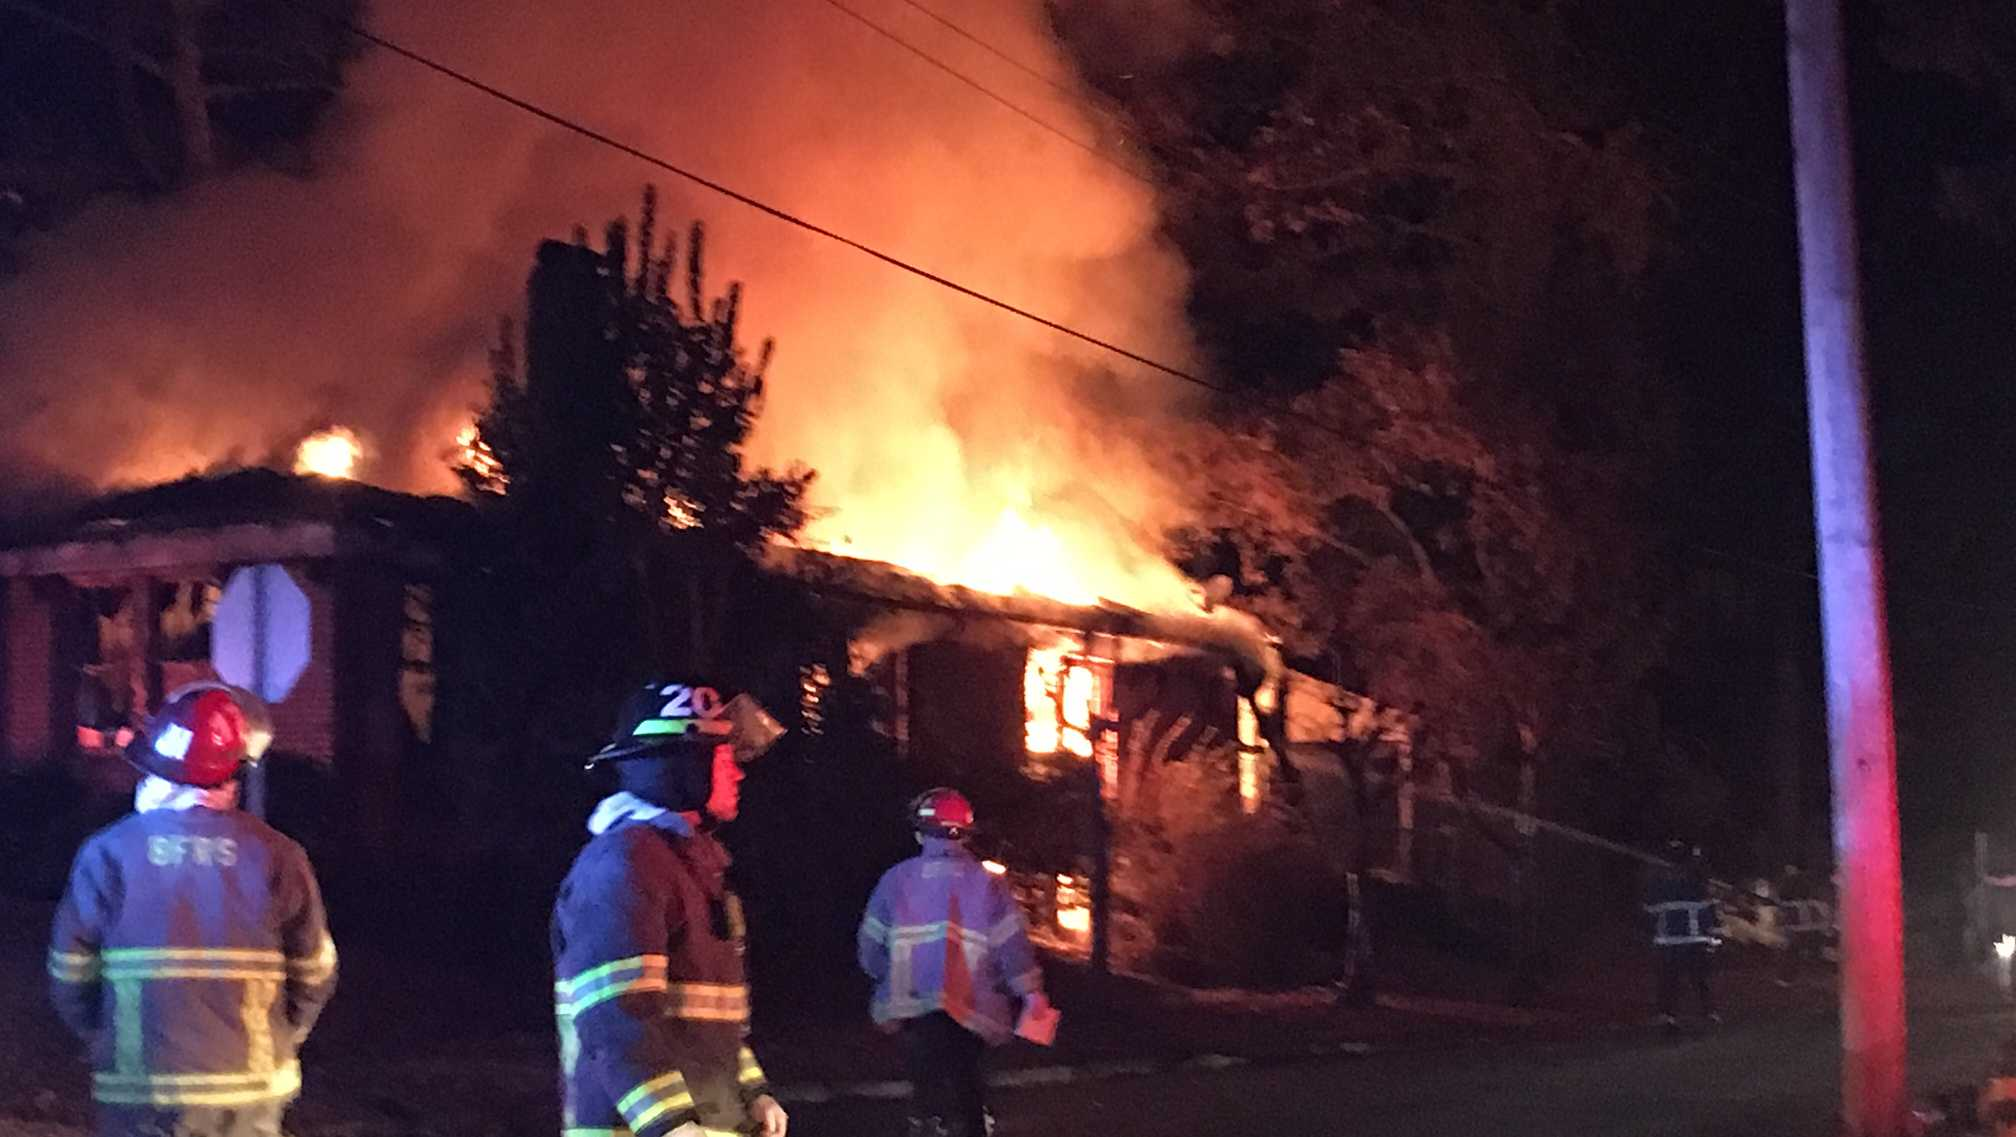 Birmingham fire crews work 3 house fires in 2 hours in Ensley area